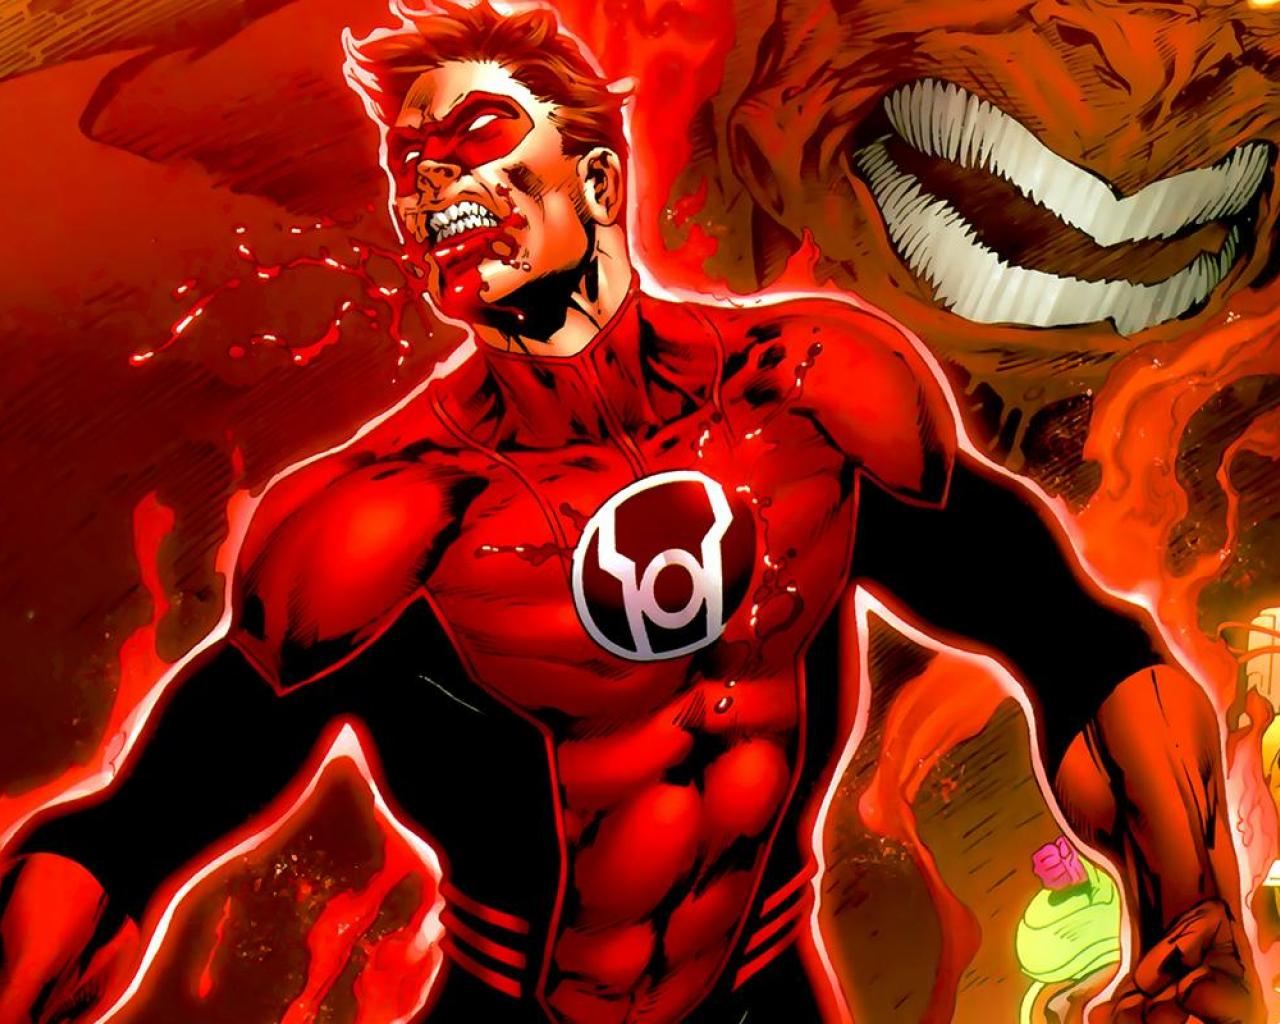 Green lantern red lantern corps comics red wallpaper HQ WALLPAPER 1280x1024